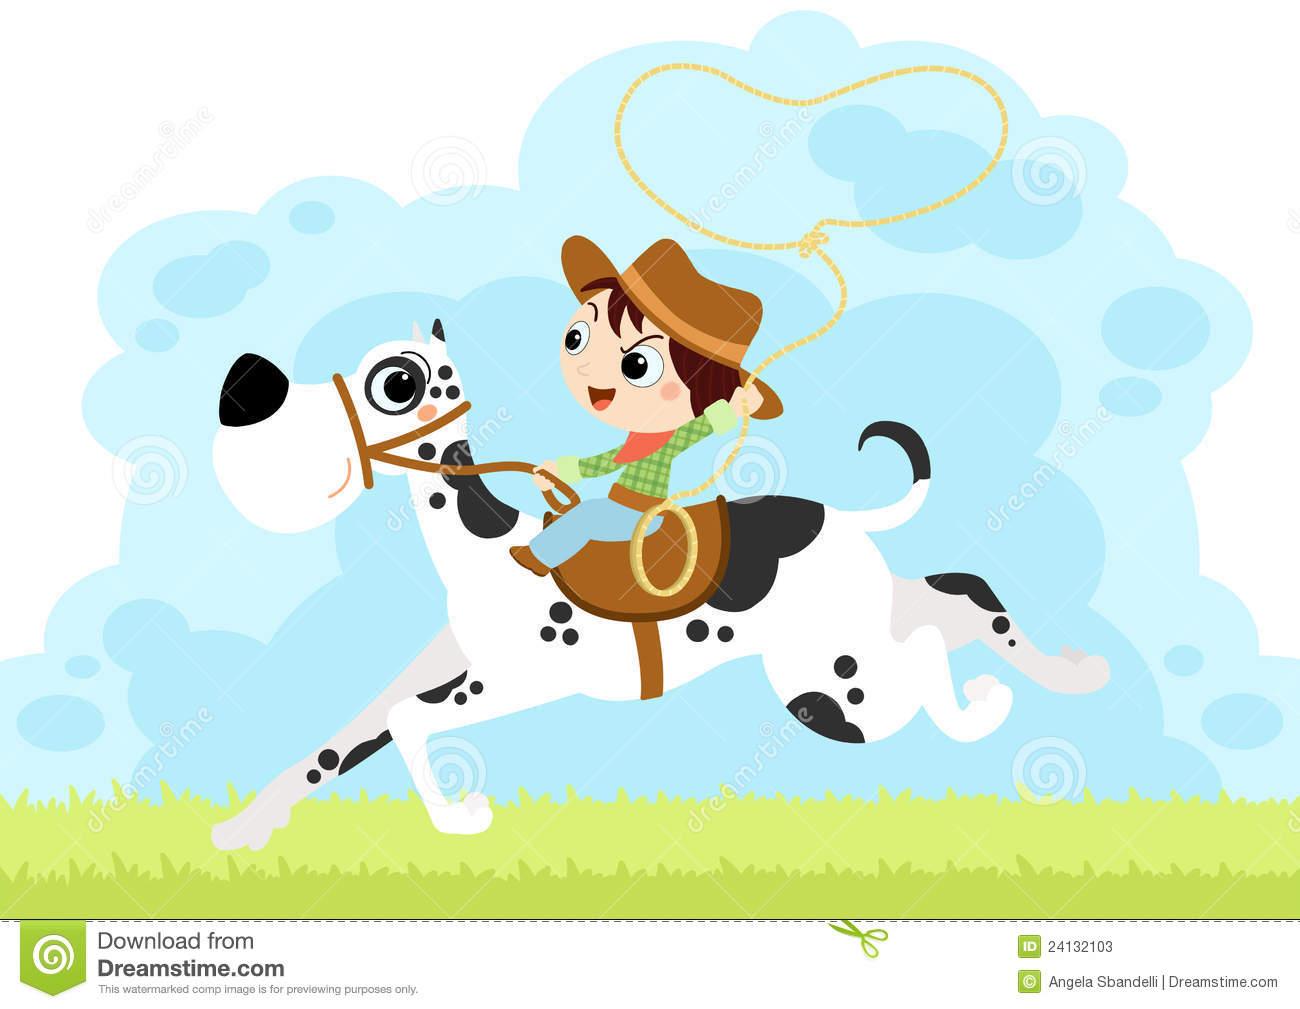 Cowboy clipart little boy Cowboy clipart Little cowboy Clipart